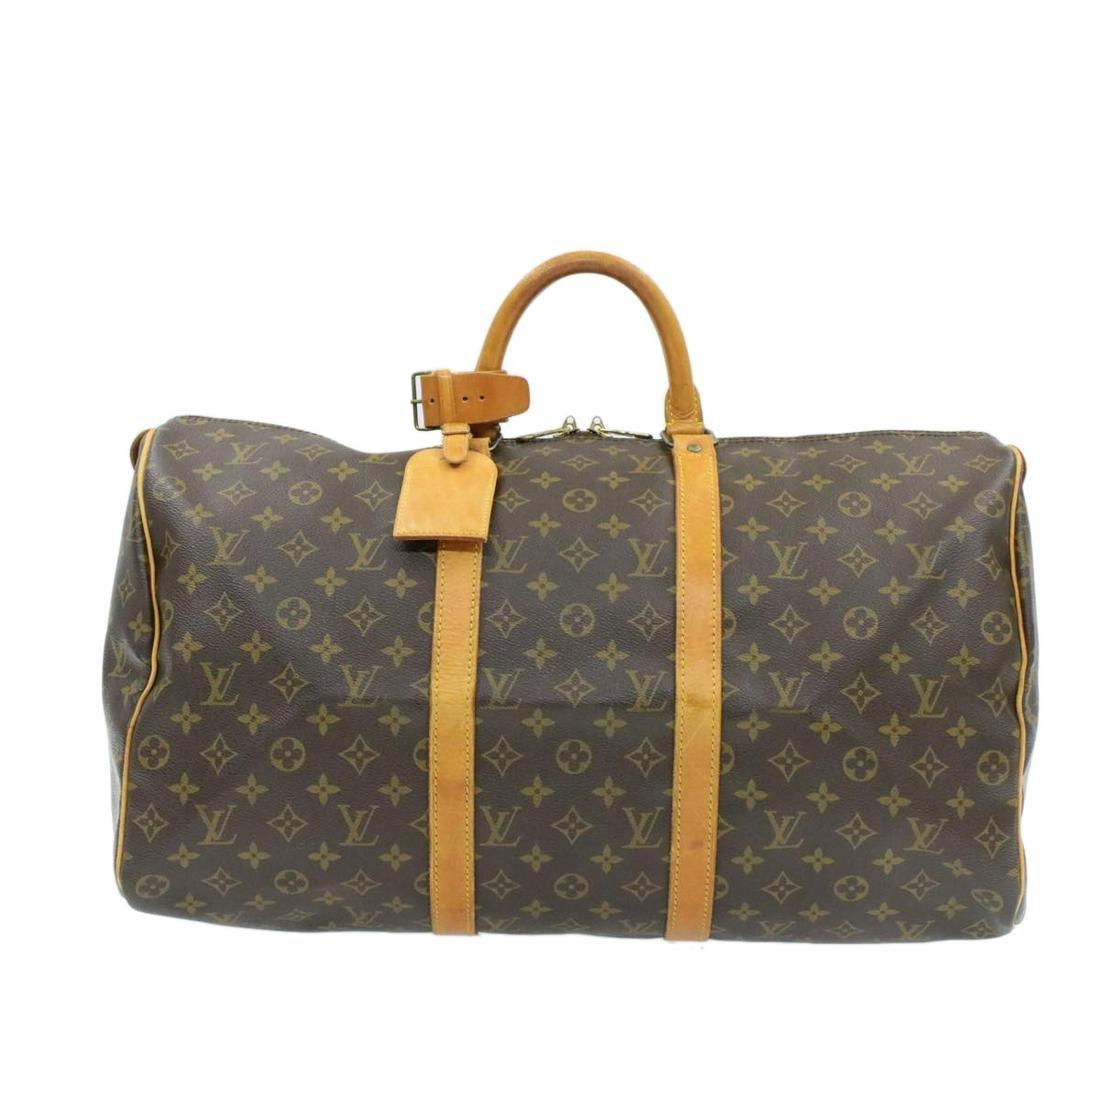 LOUIS VUITTON Monogram Keepall 50 Boston Bag    **Screw